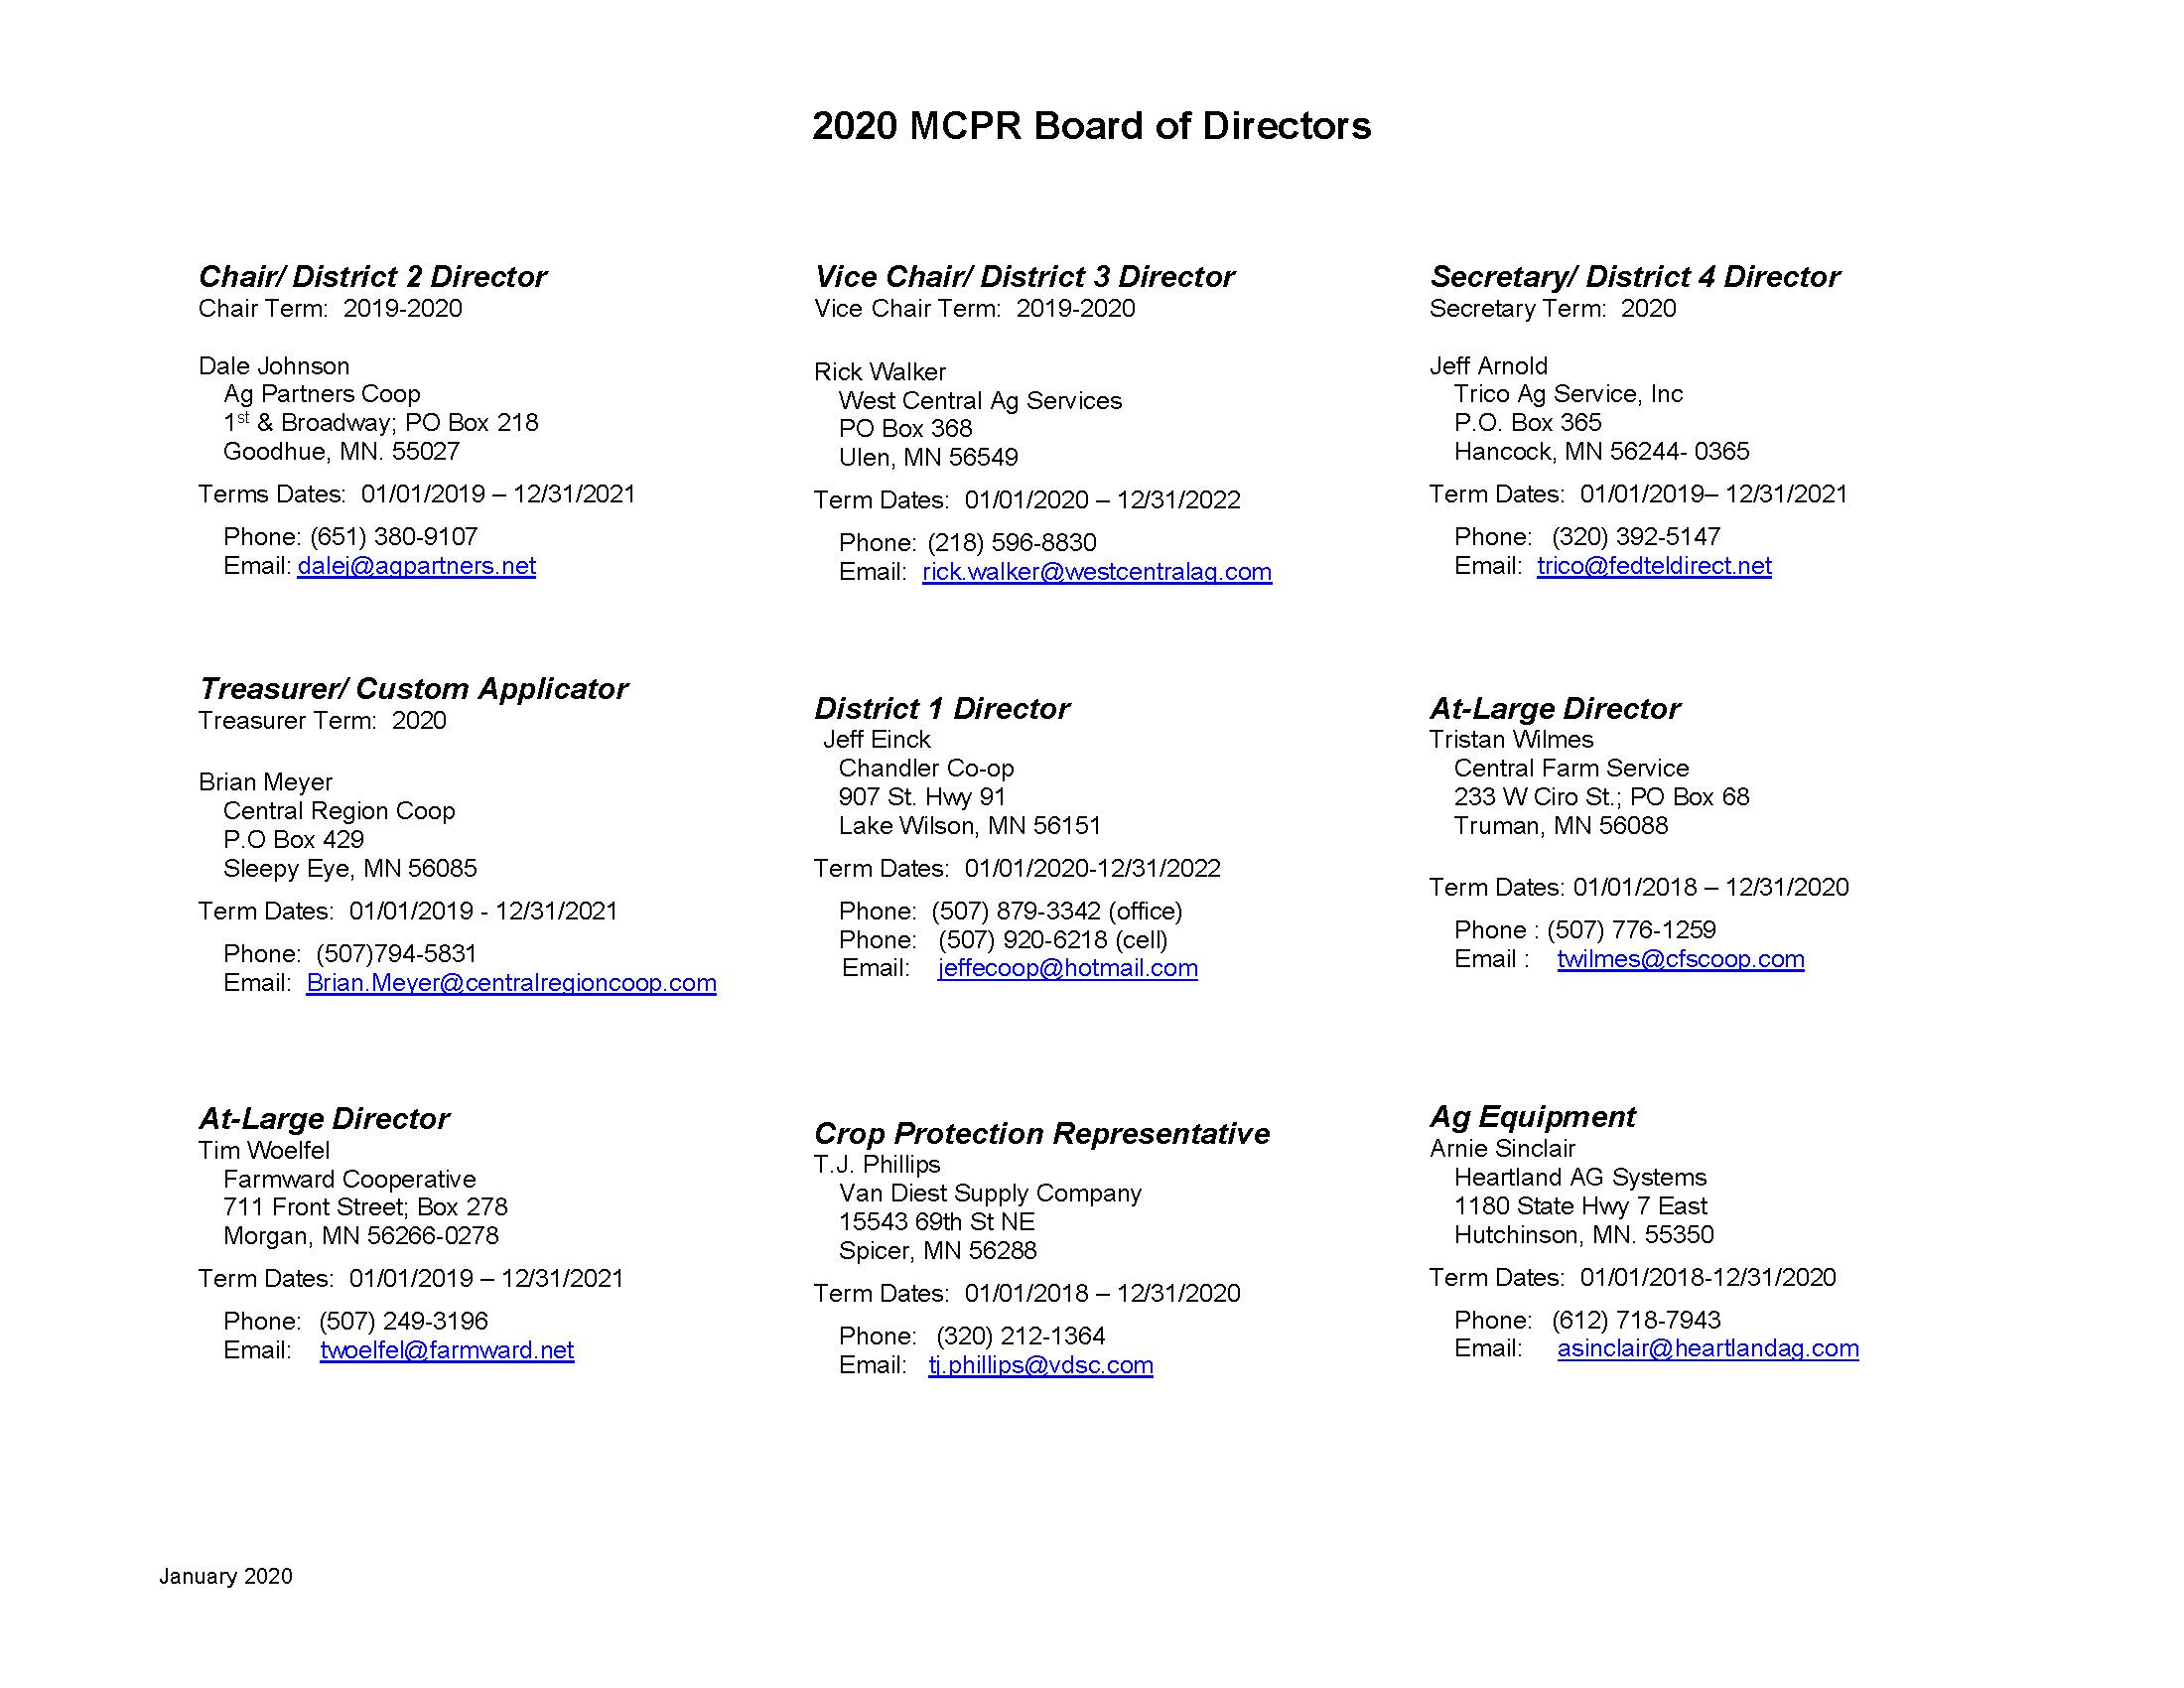 2020 MCPR Board of Directors_Page_1